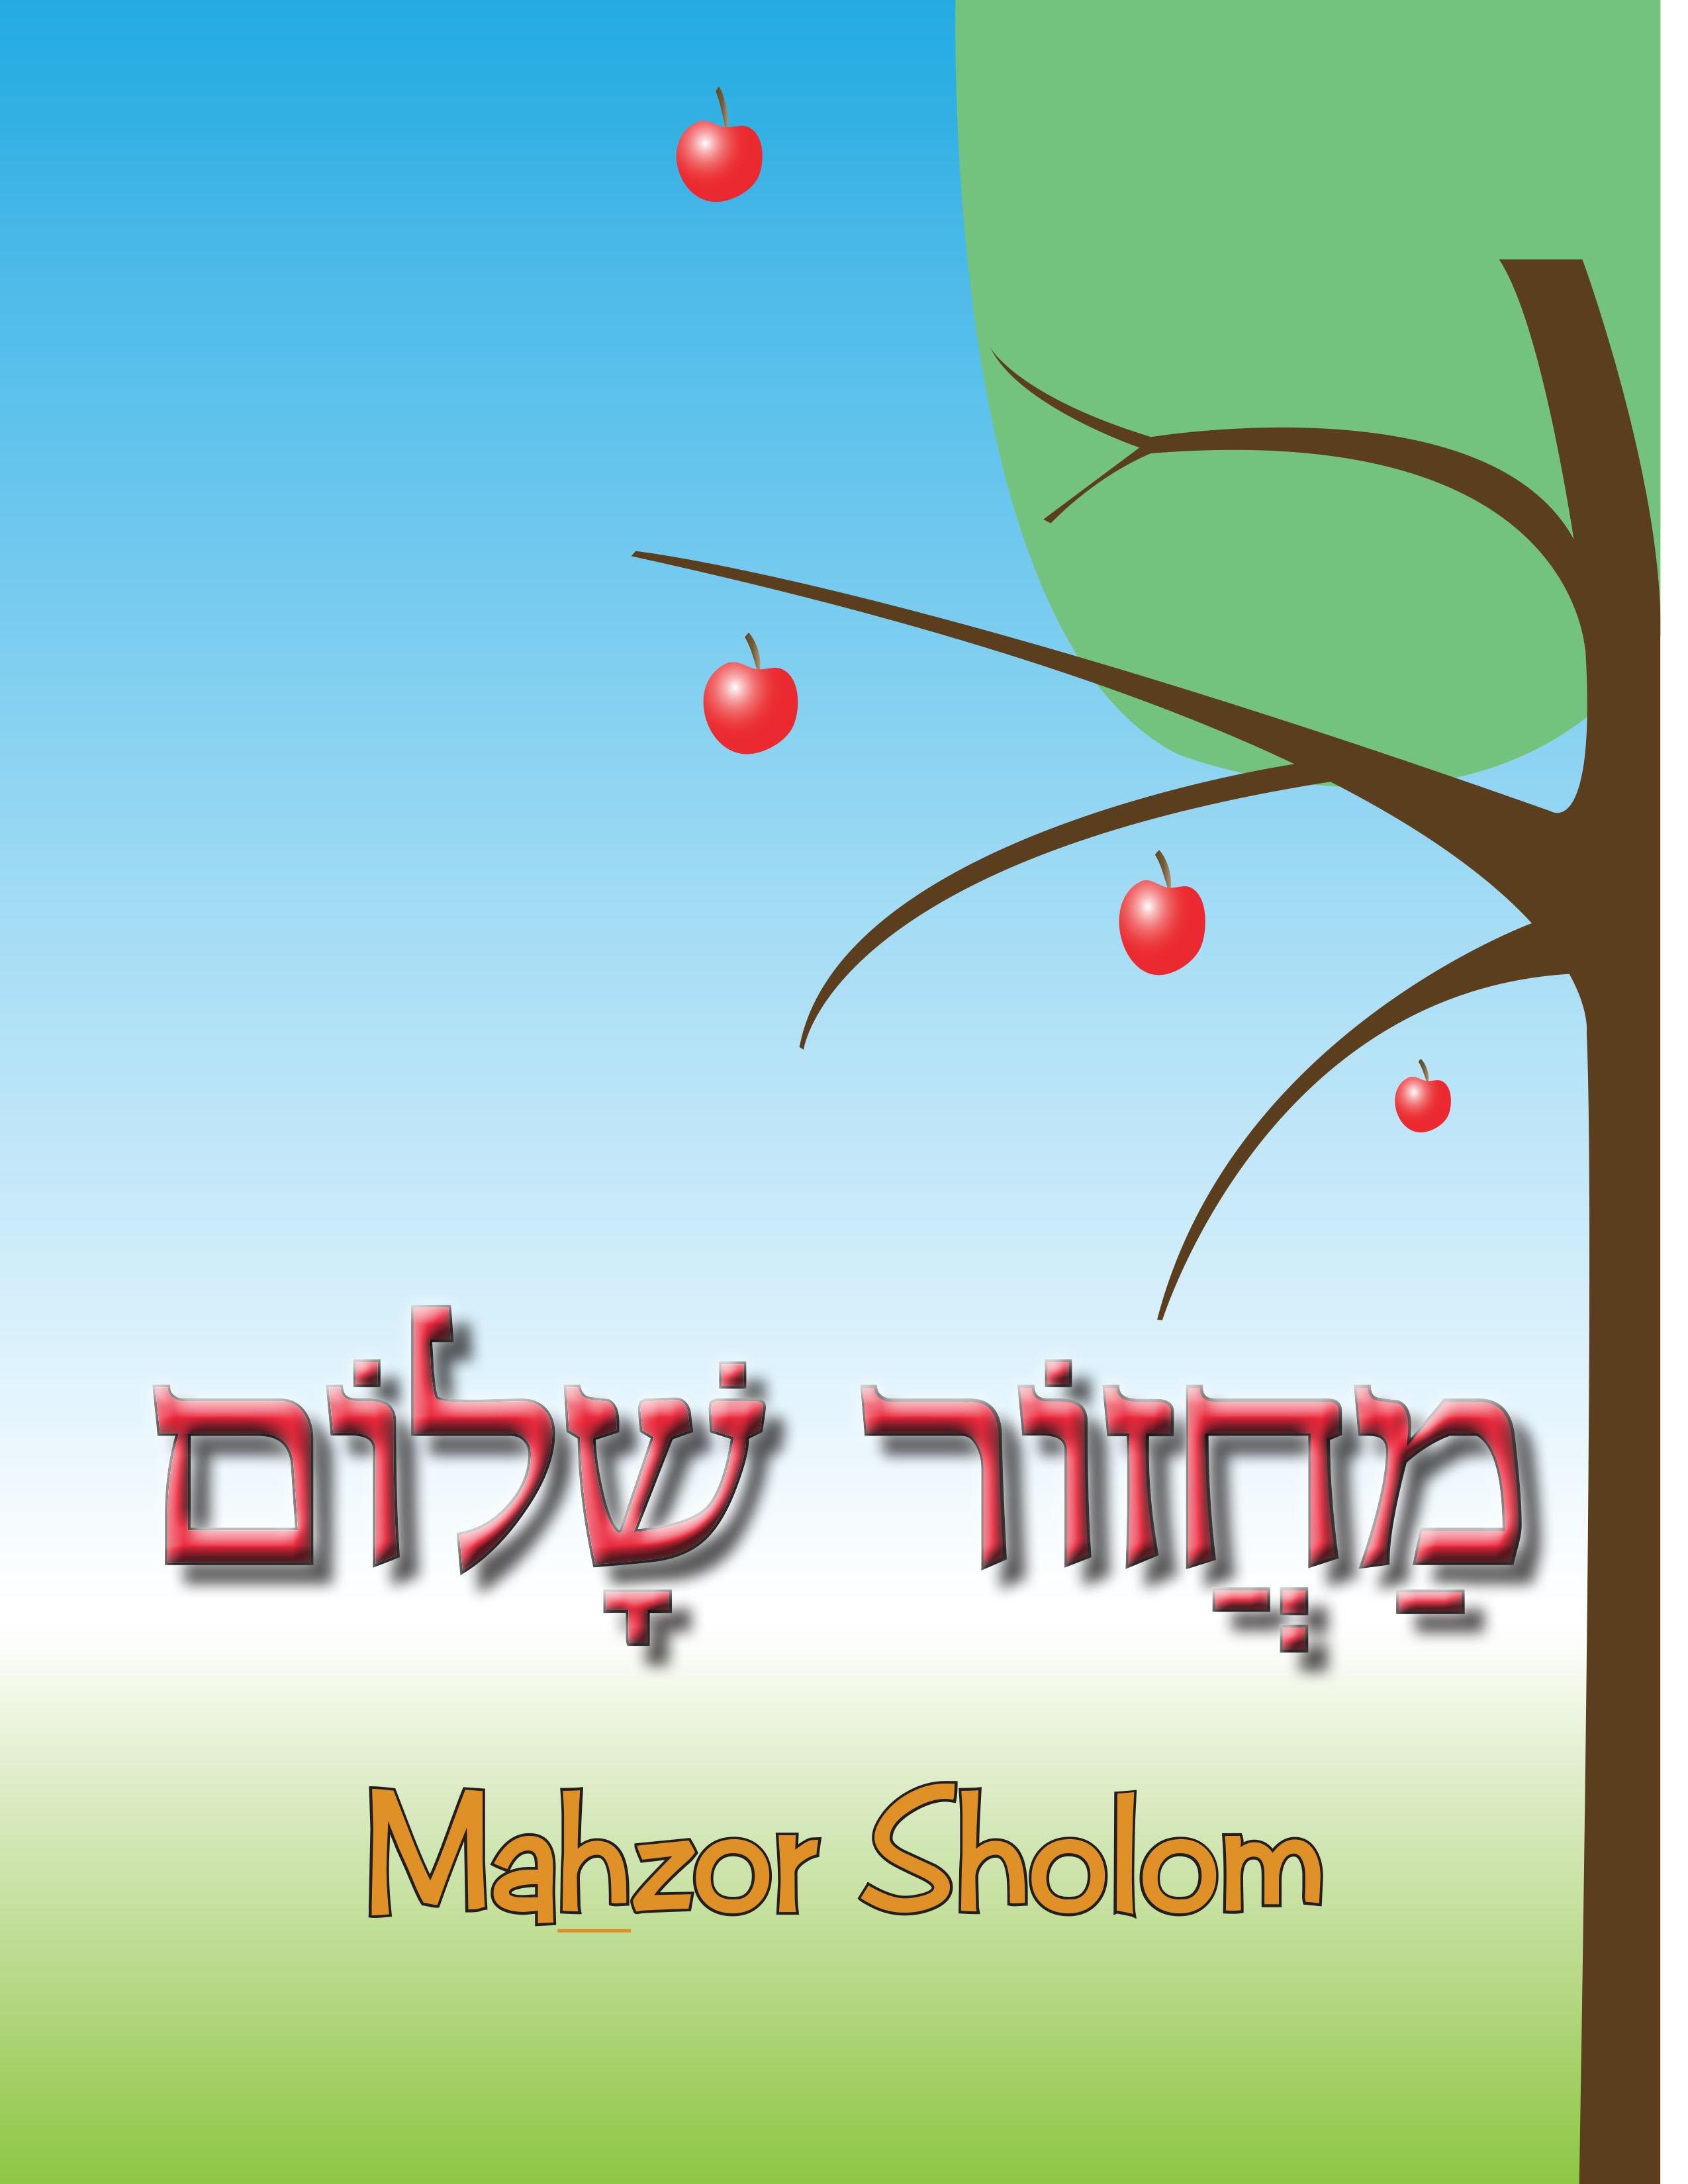 Mahzor Sholom